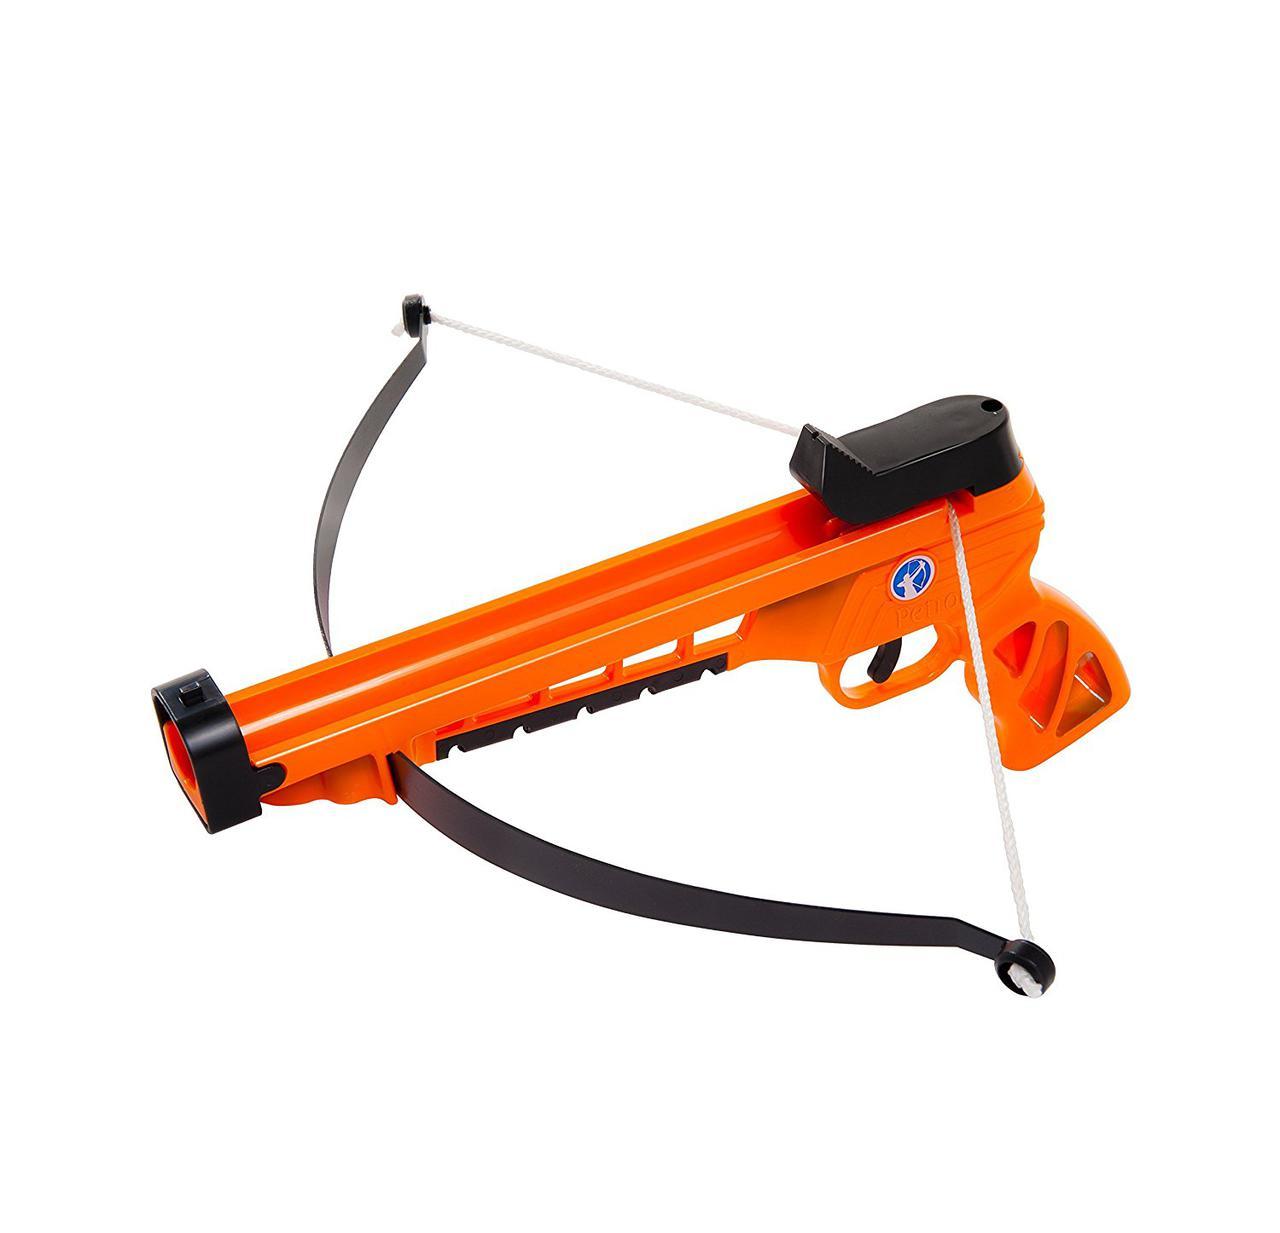 Арбалет-пистолет Petron SuperShot серии Stealth (162/2)